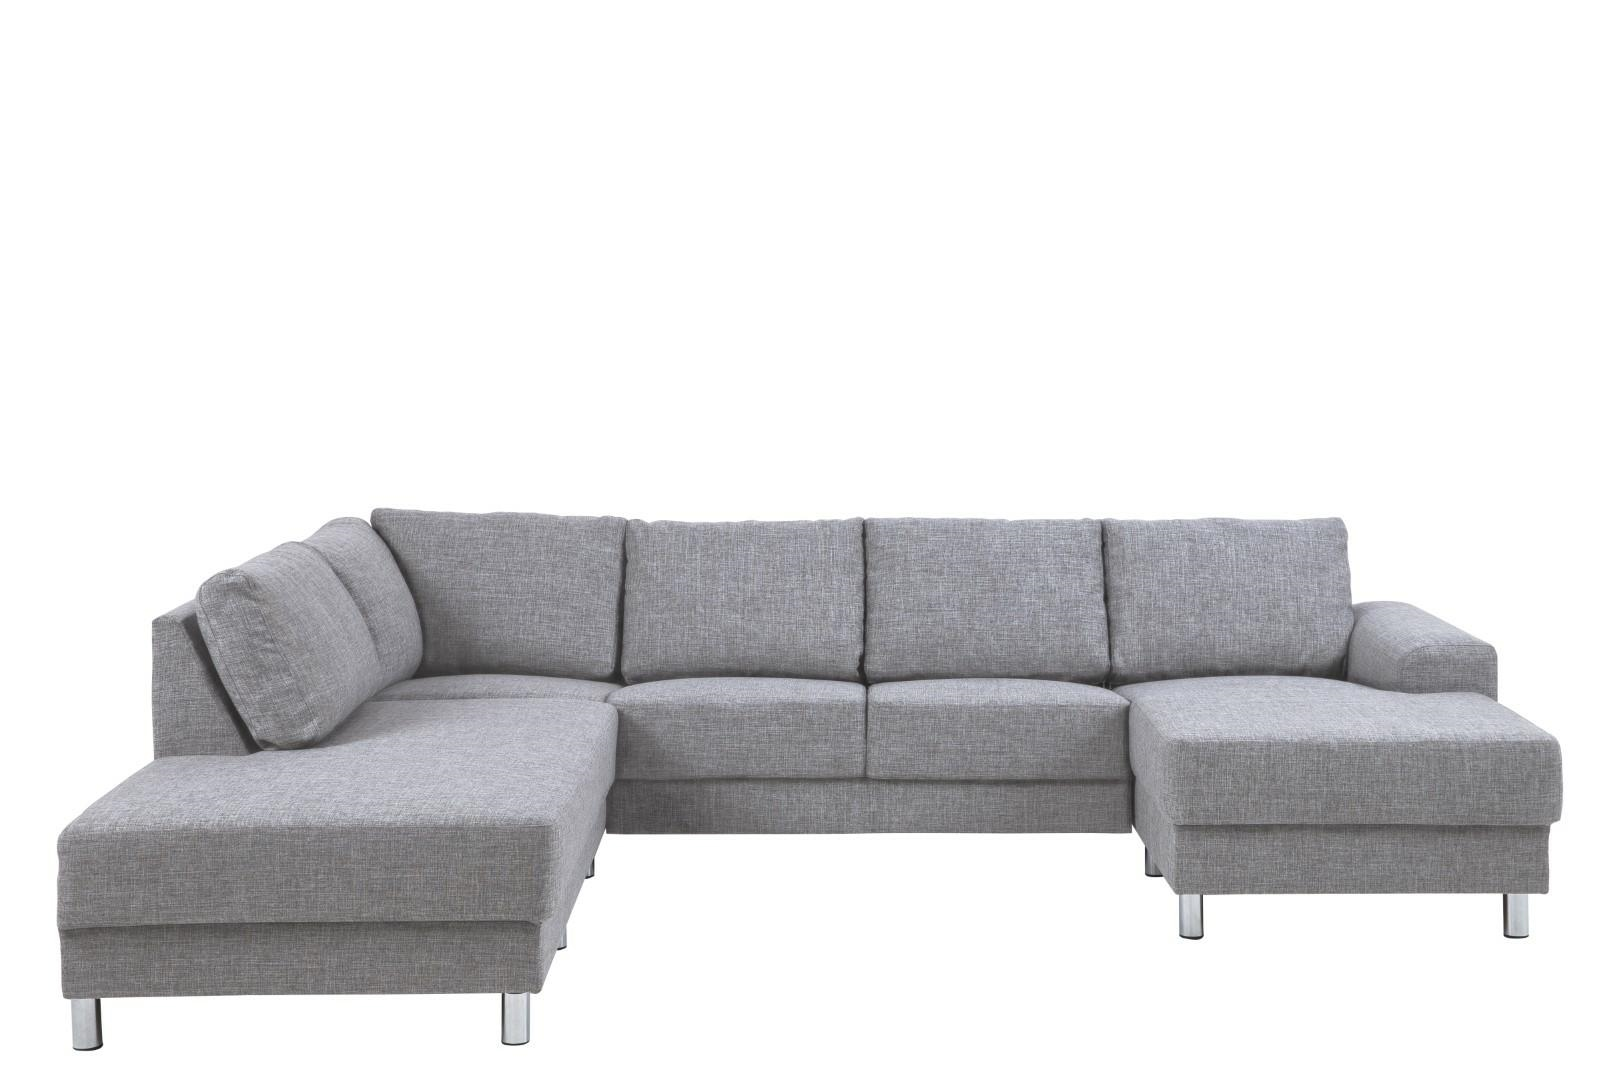 Narożna sofa Calverton Szara lewa - zdjęcie nr 0